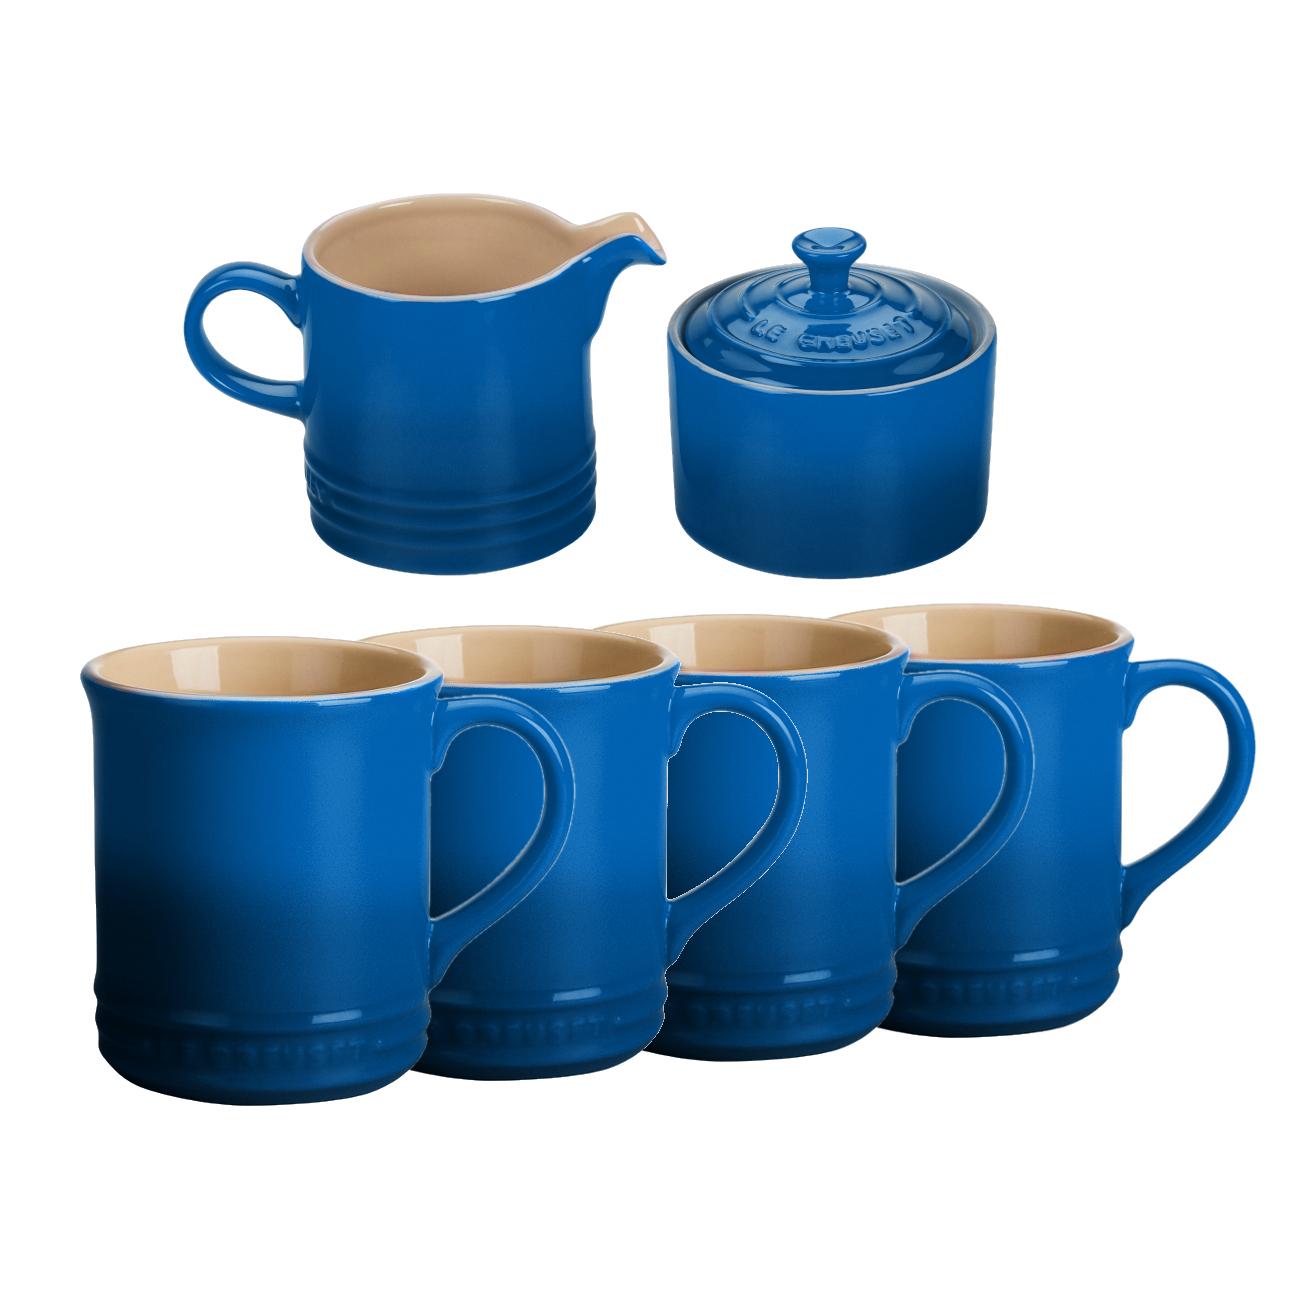 Le Creuset 6 Piece Marseille Blue Stoneware Coffee or Tea Service Set With Mugs & Cream & Sugar Set